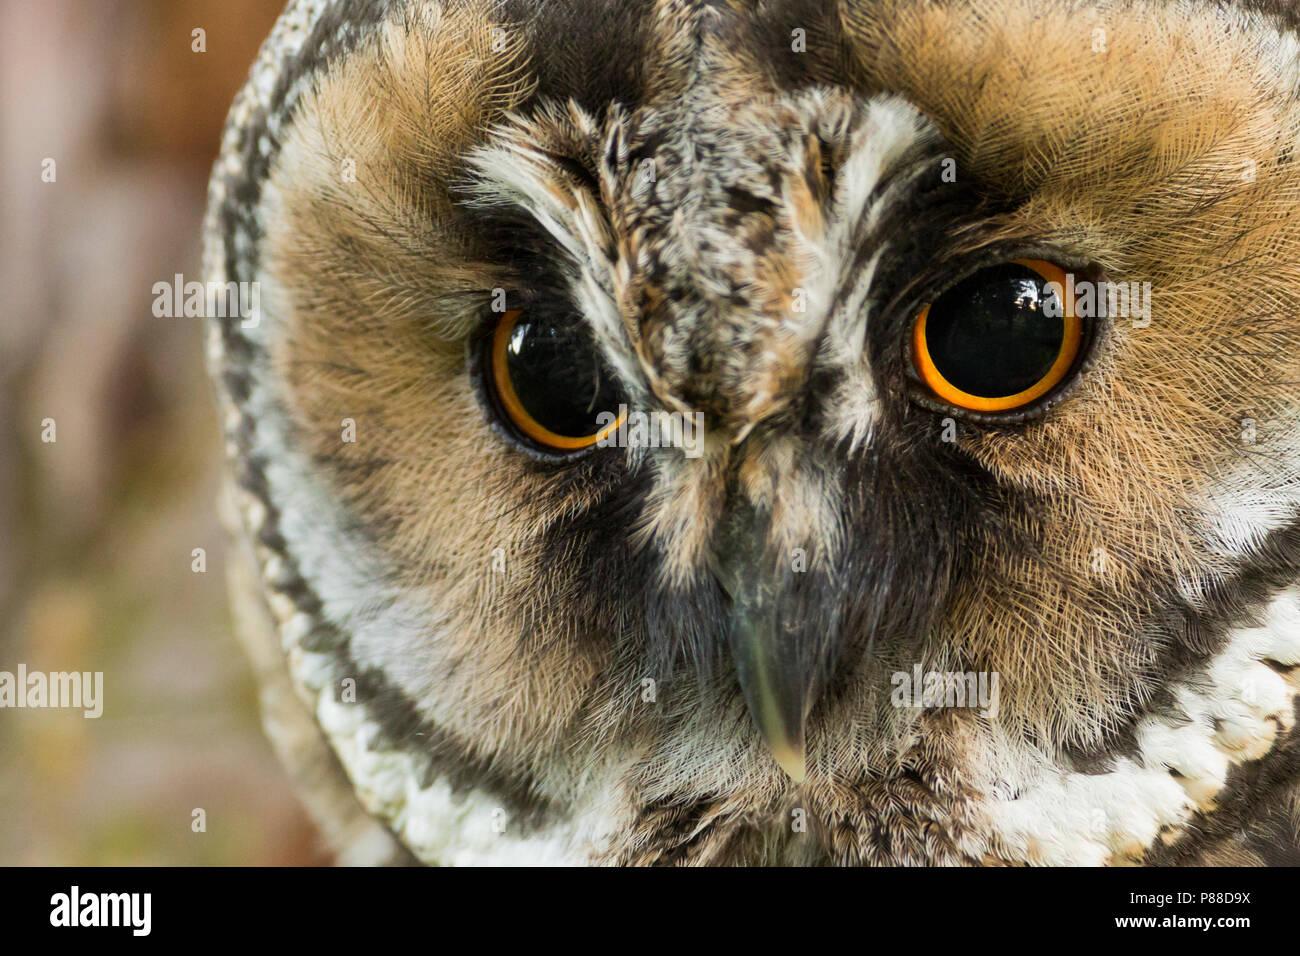 Long-eared Owl - Waldohreule - Asio otus otus, Germany Stock Photo